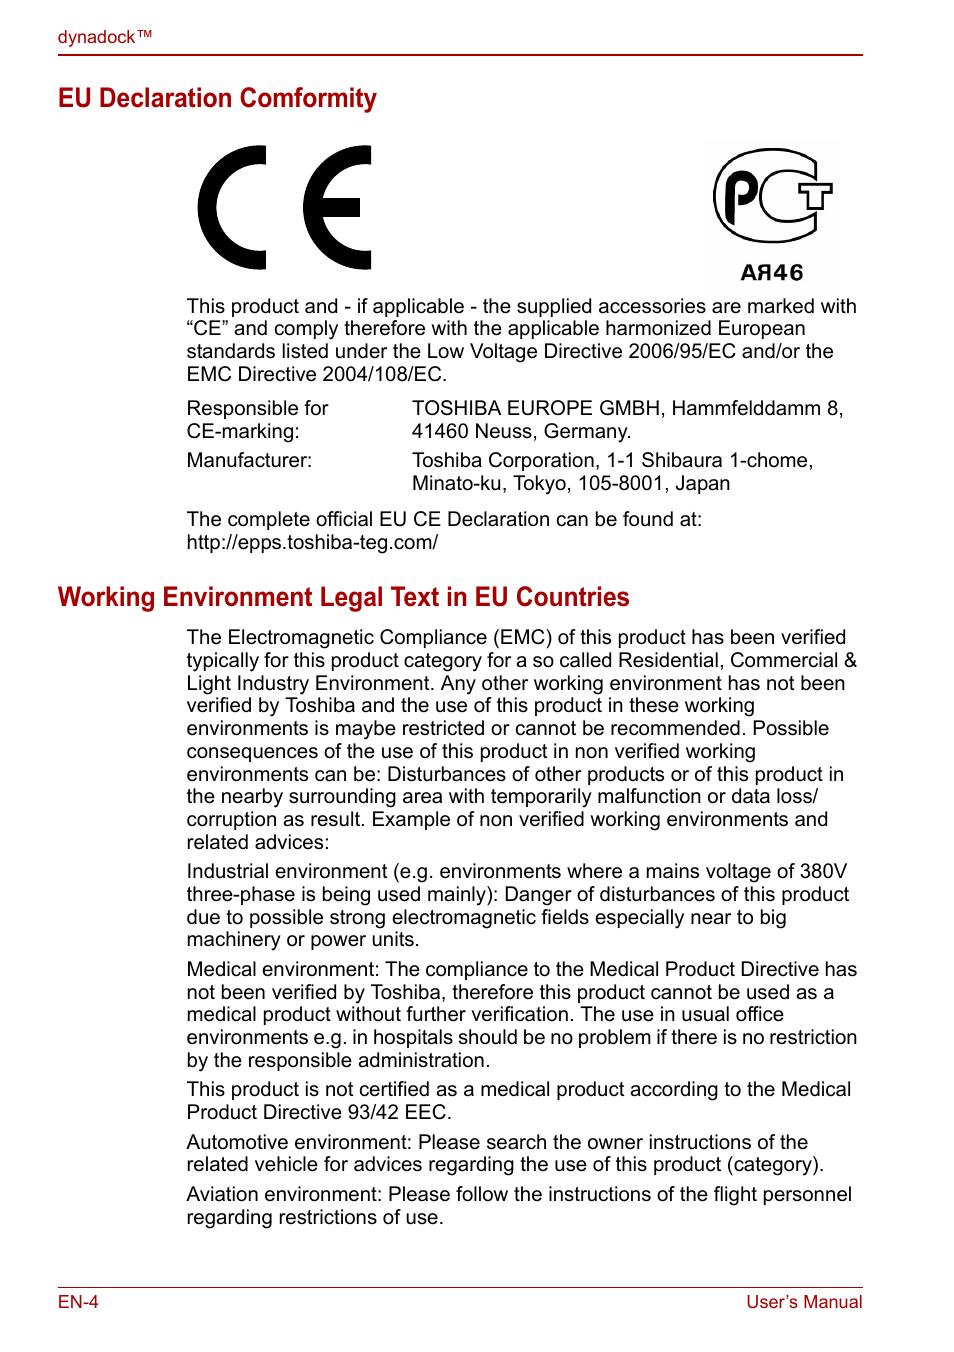 eu declaration comformity working environment legal text in eu rh manualsdir com Docking Station for Toshiba Satellite L655 toshiba dynadock u10 user manual